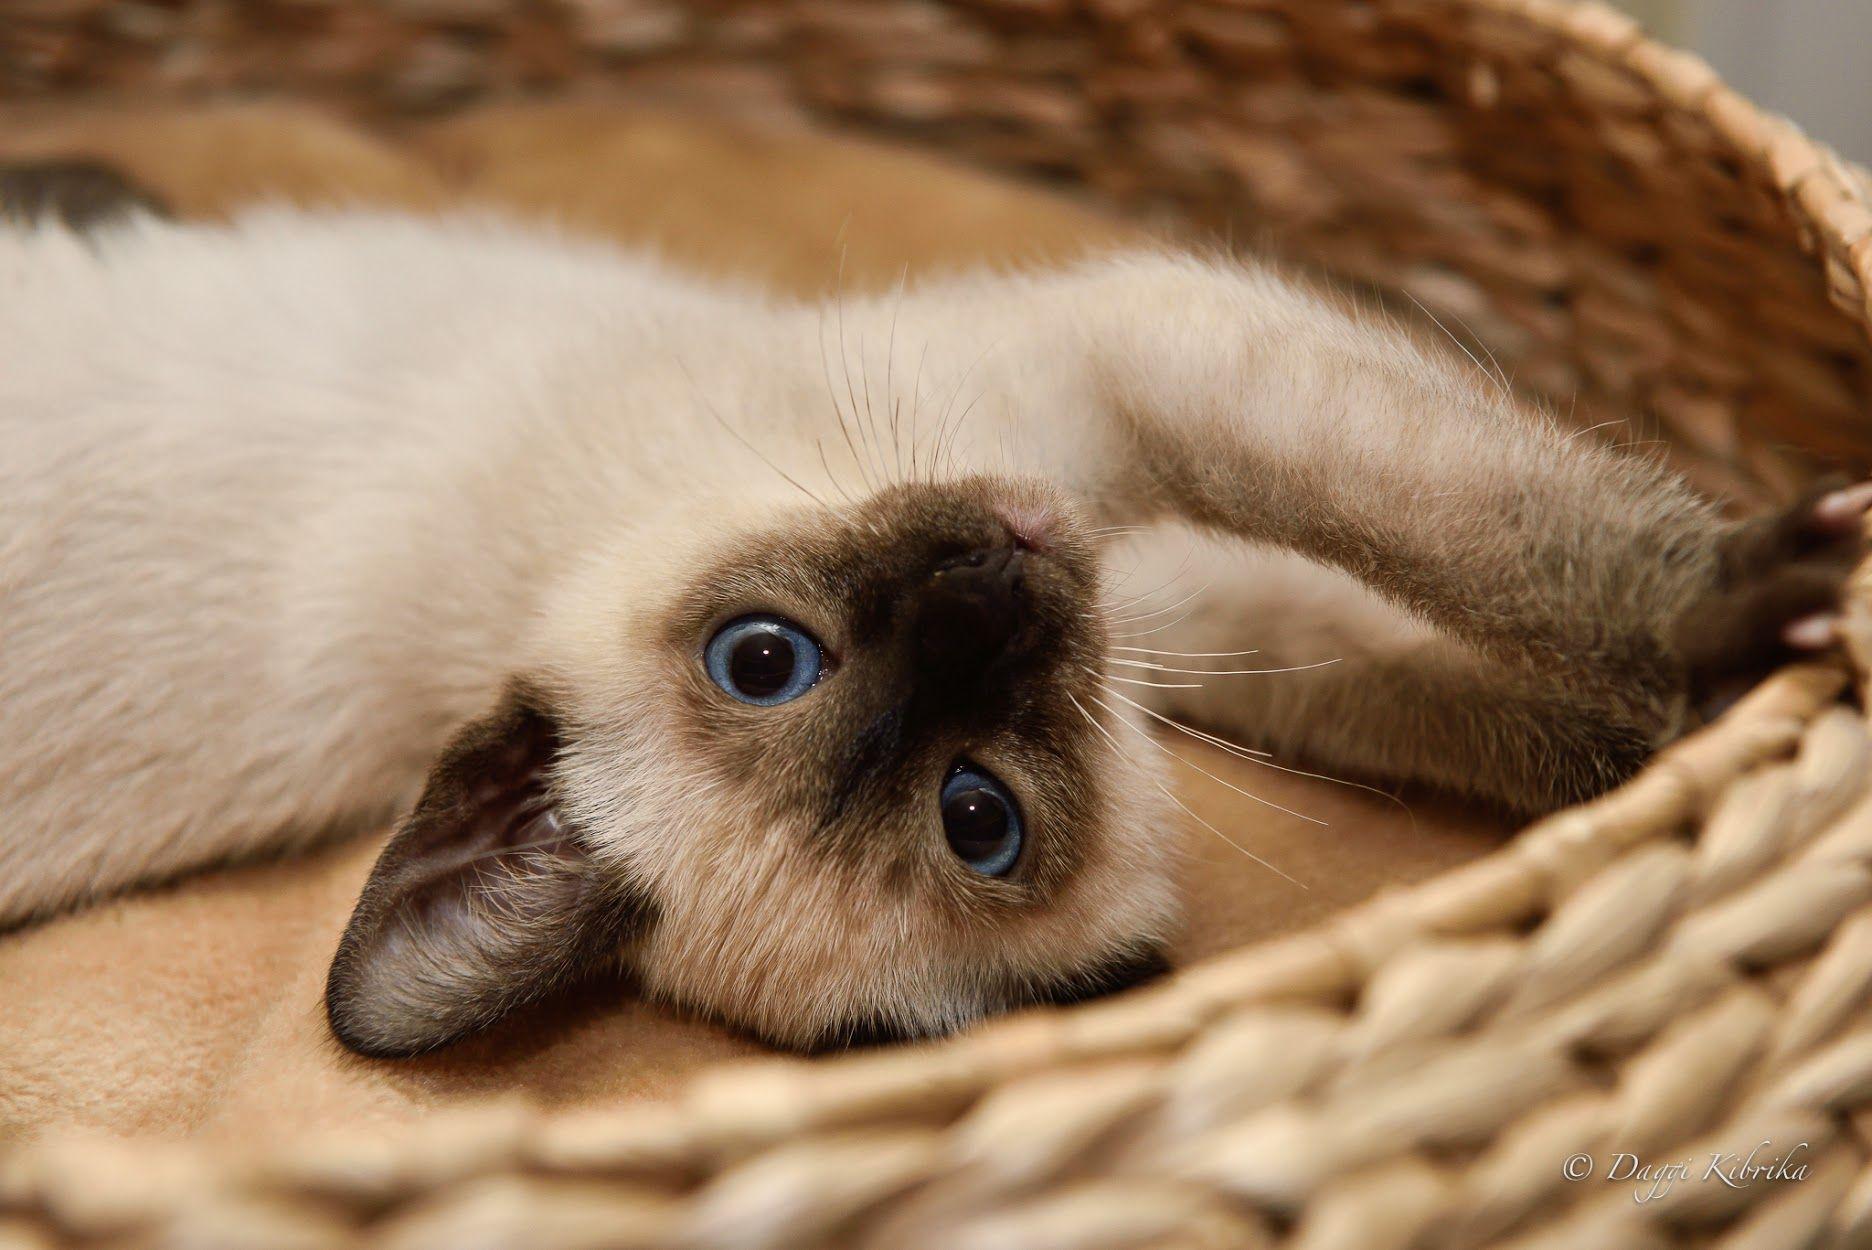 Daggi Kibrika Google Siamese Kittens Kitten Adoption Cats And Kittens